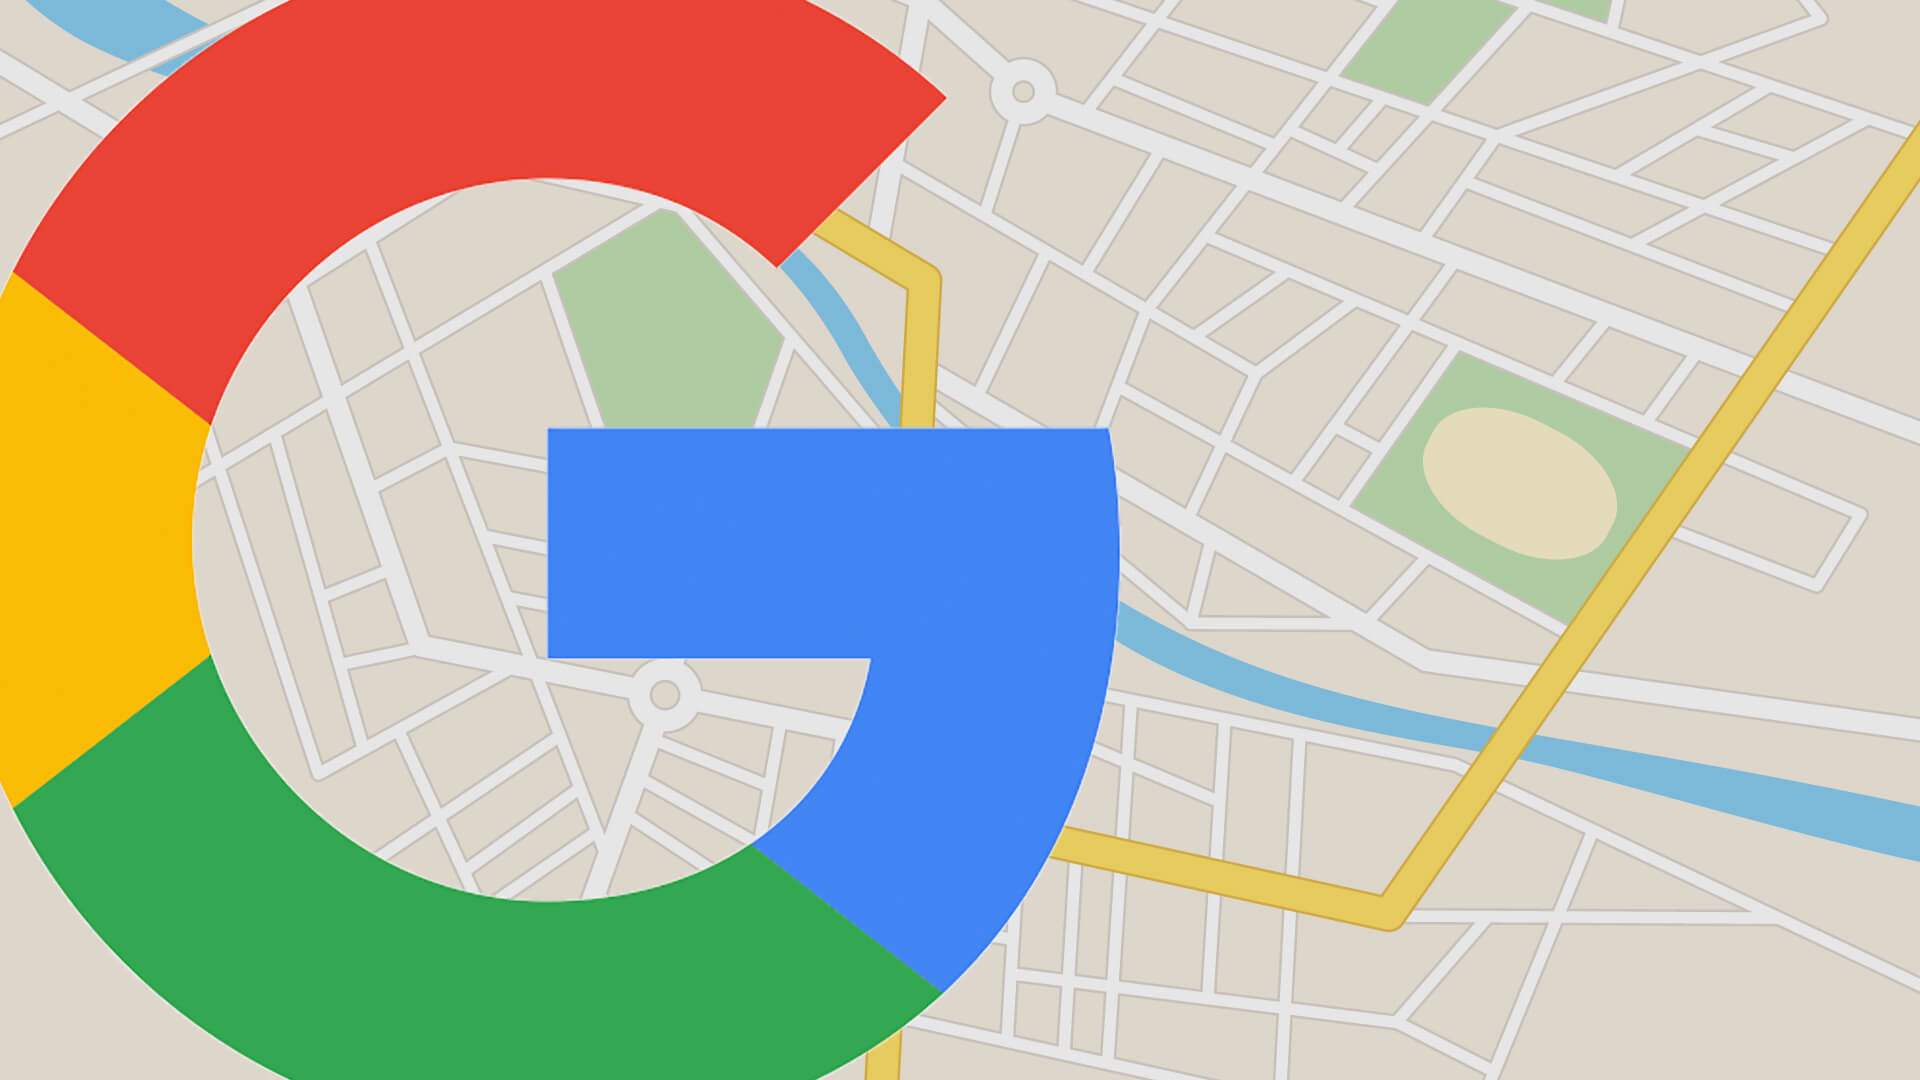 google maps - HD1920×1080